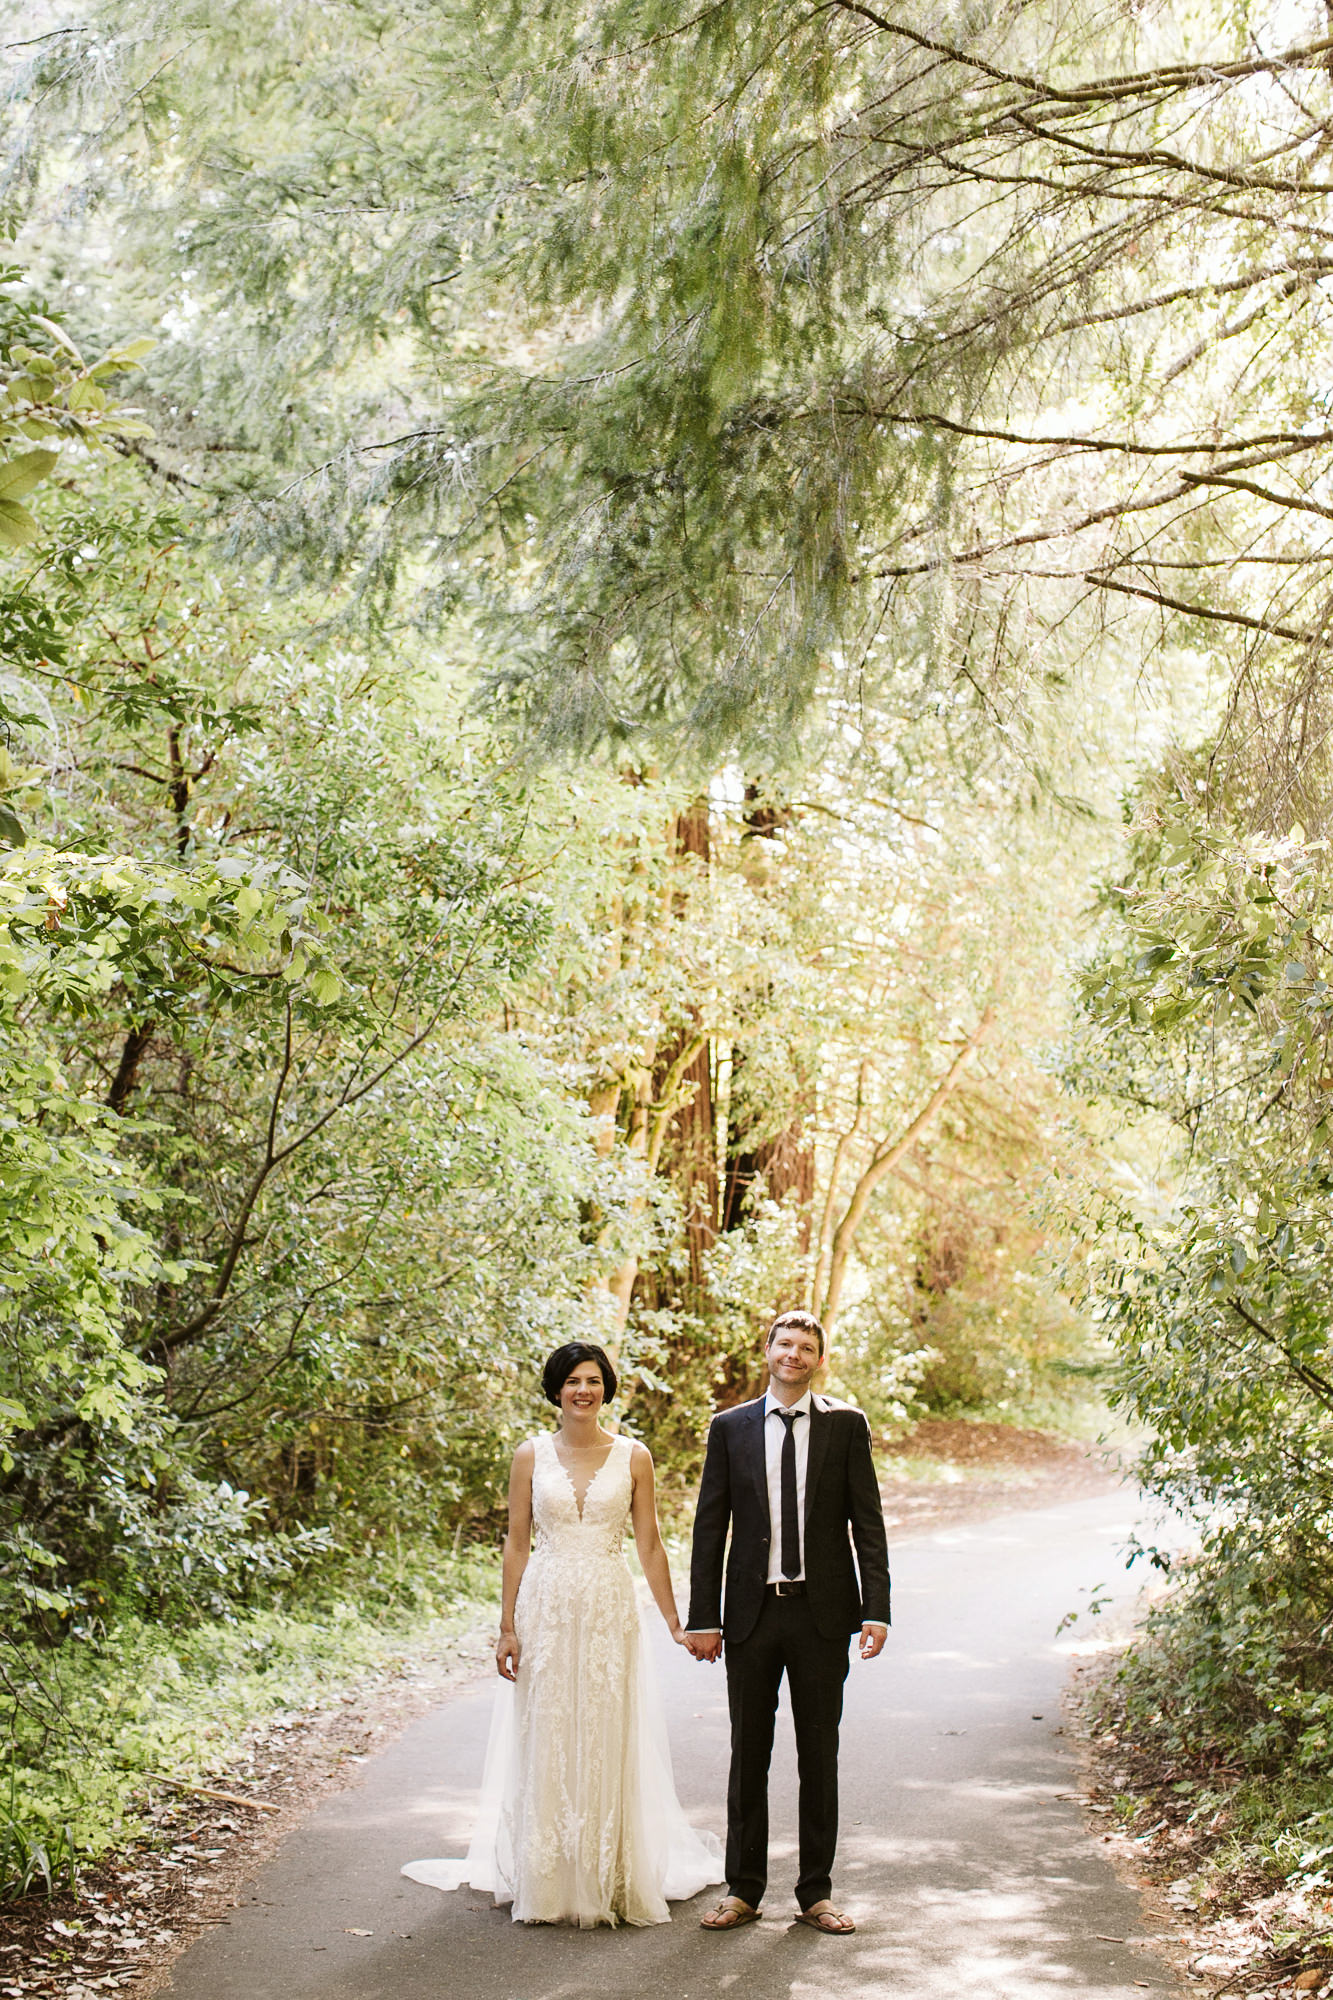 California-wedding-photographer-alfonso-flores-pamplin-groove-255.jpg